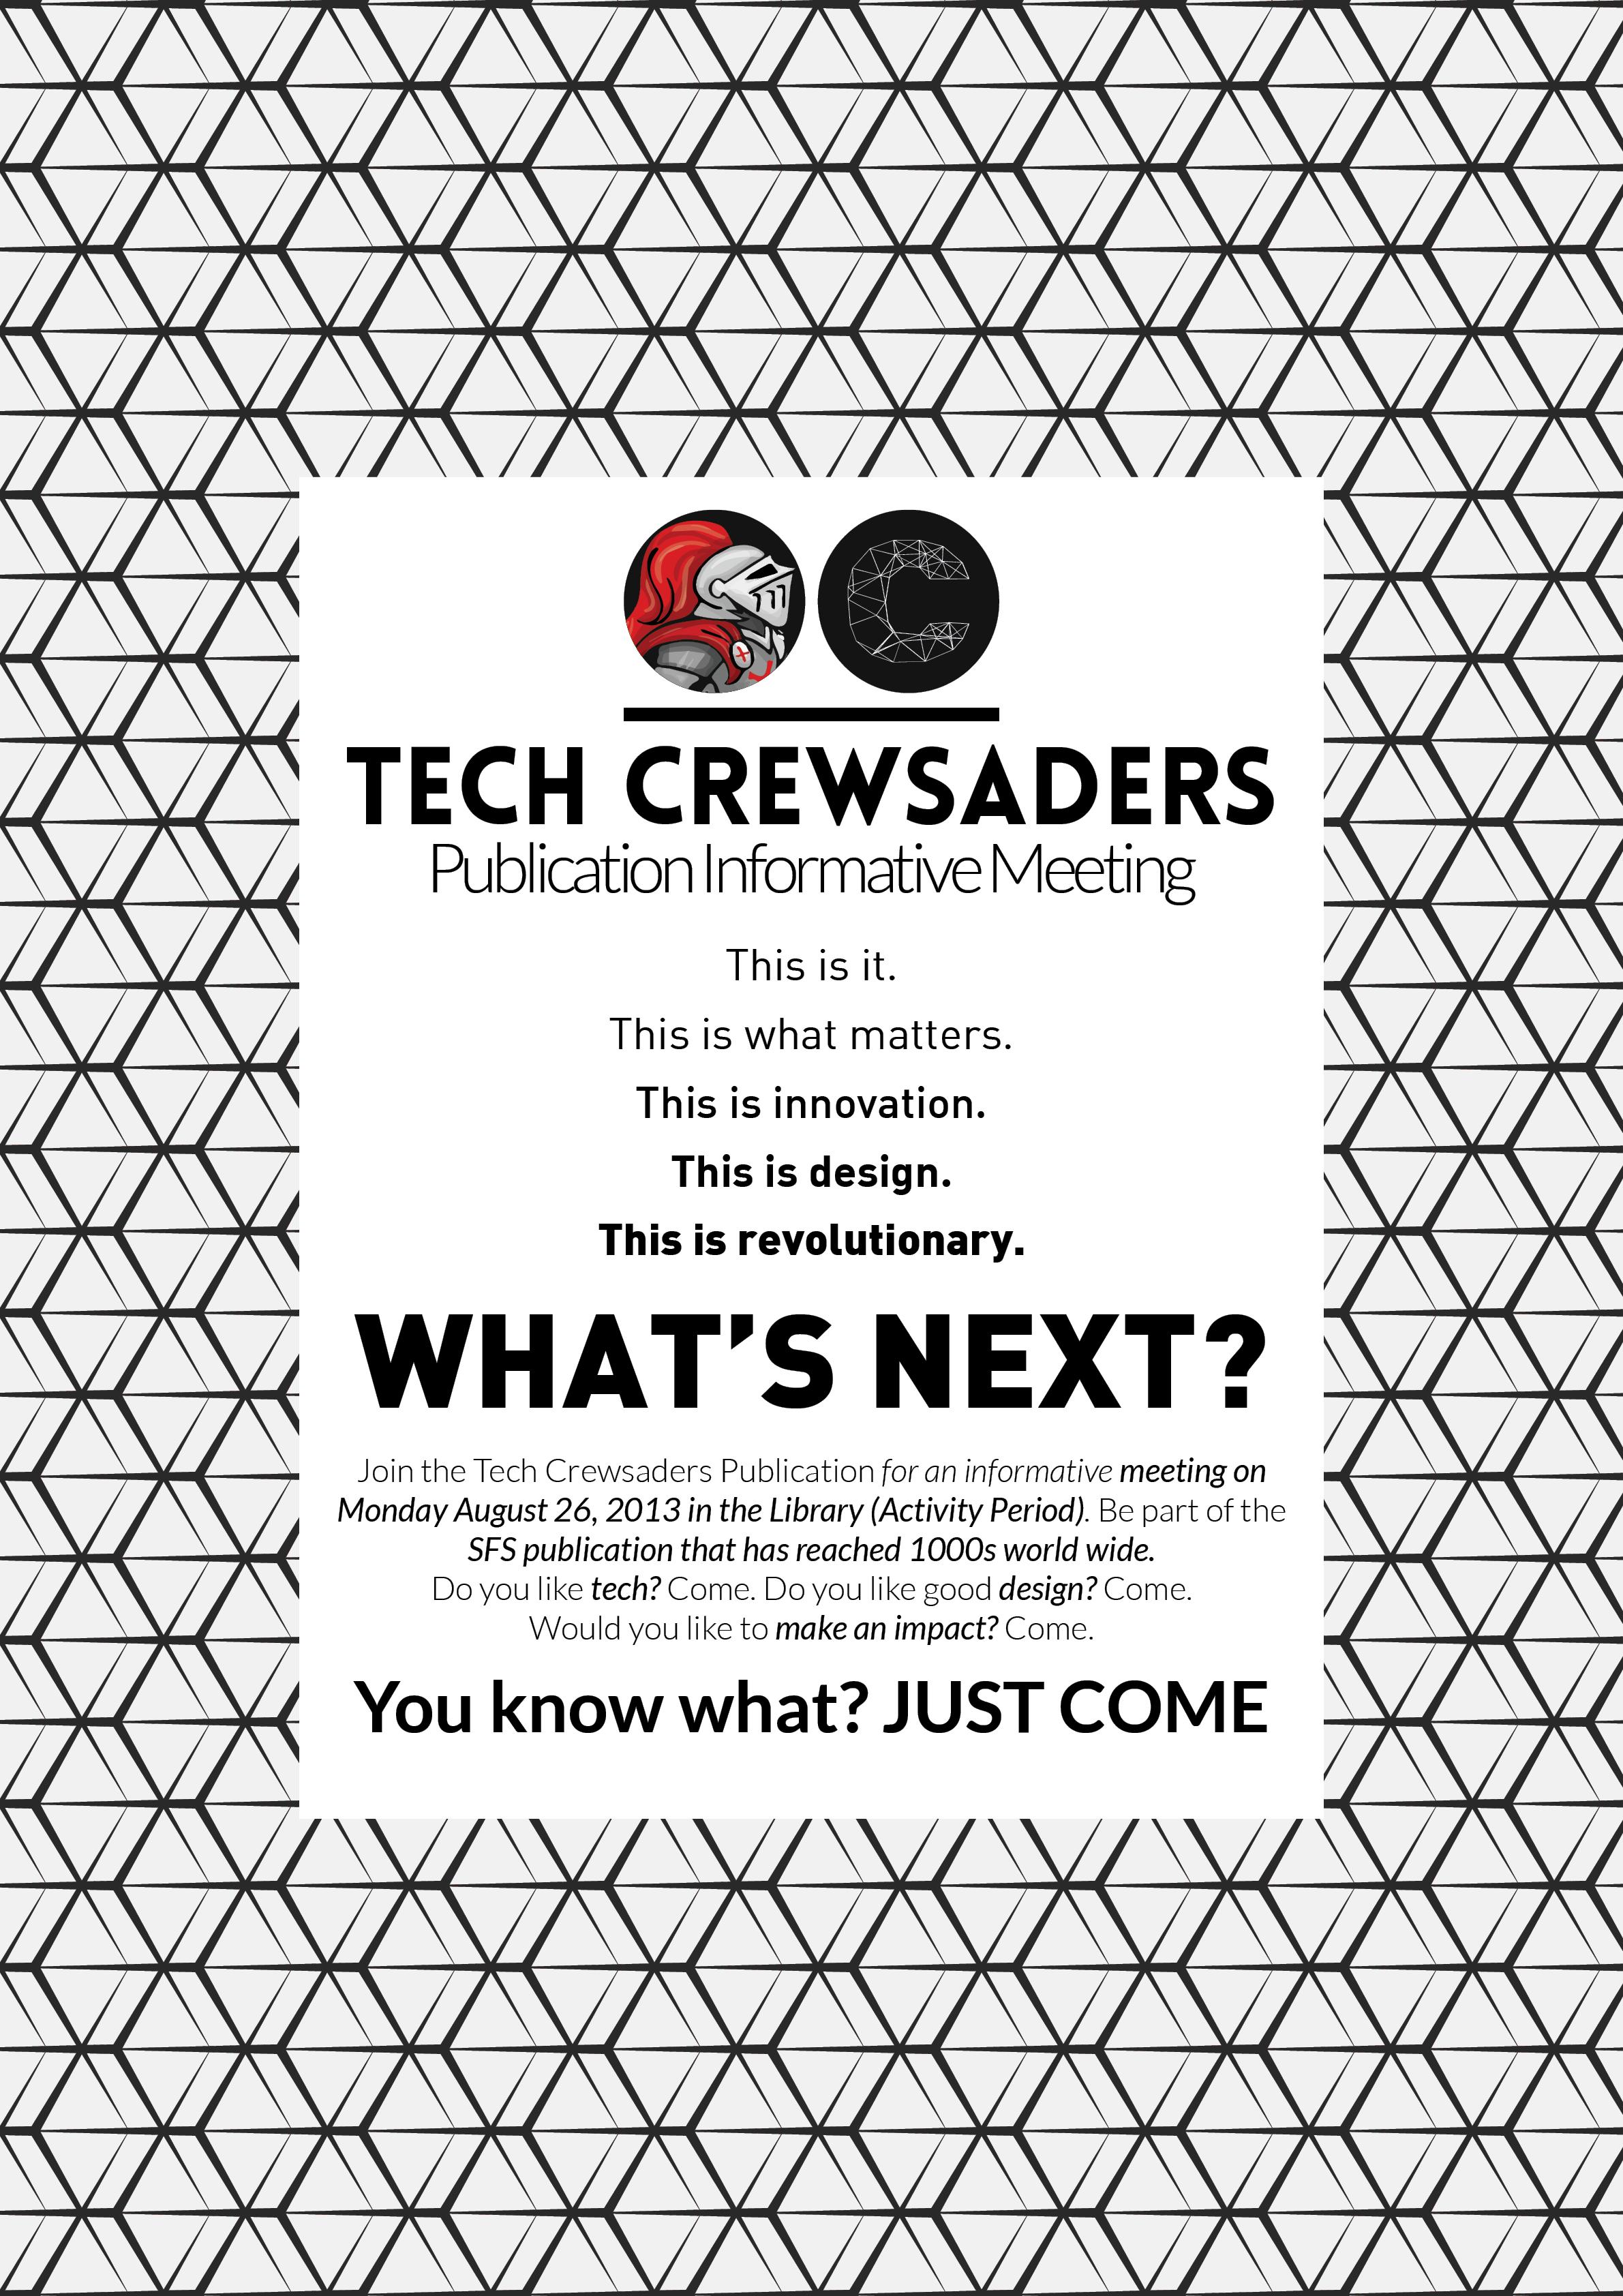 2013-2014 Recruitment Poster 3